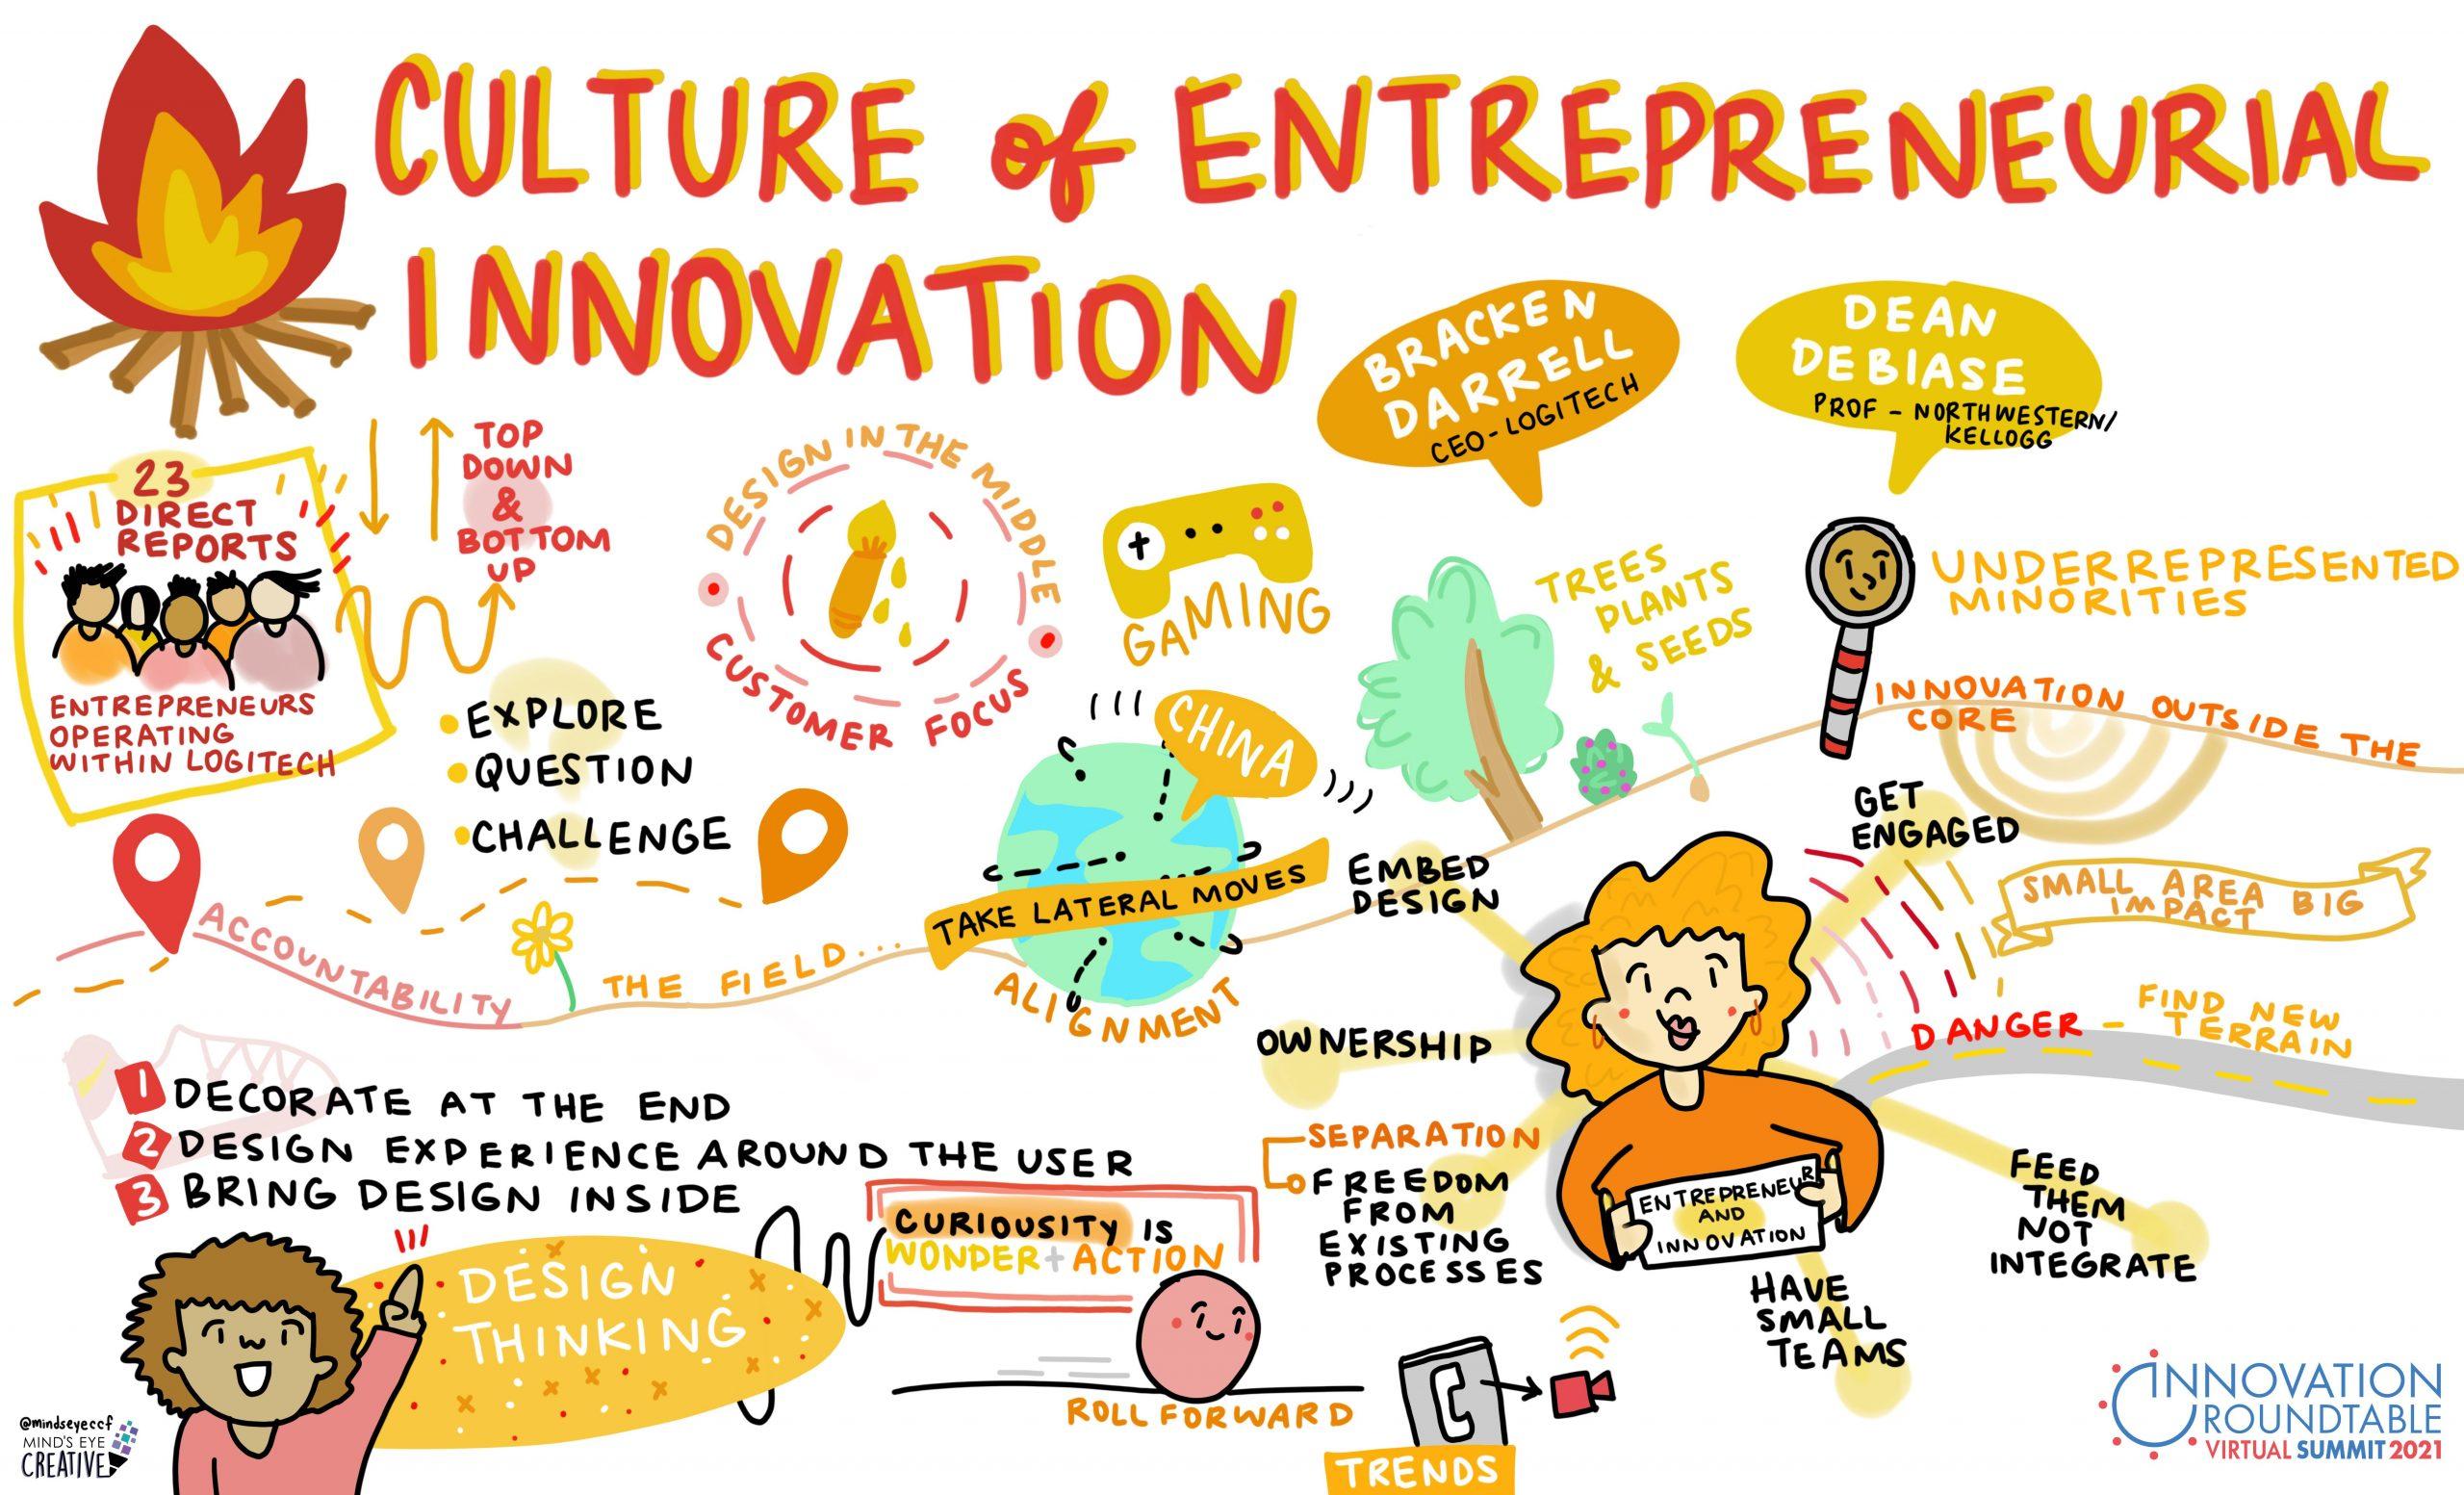 04_Innovation Roundtable_Bracken Darrell and Dean DeBiase